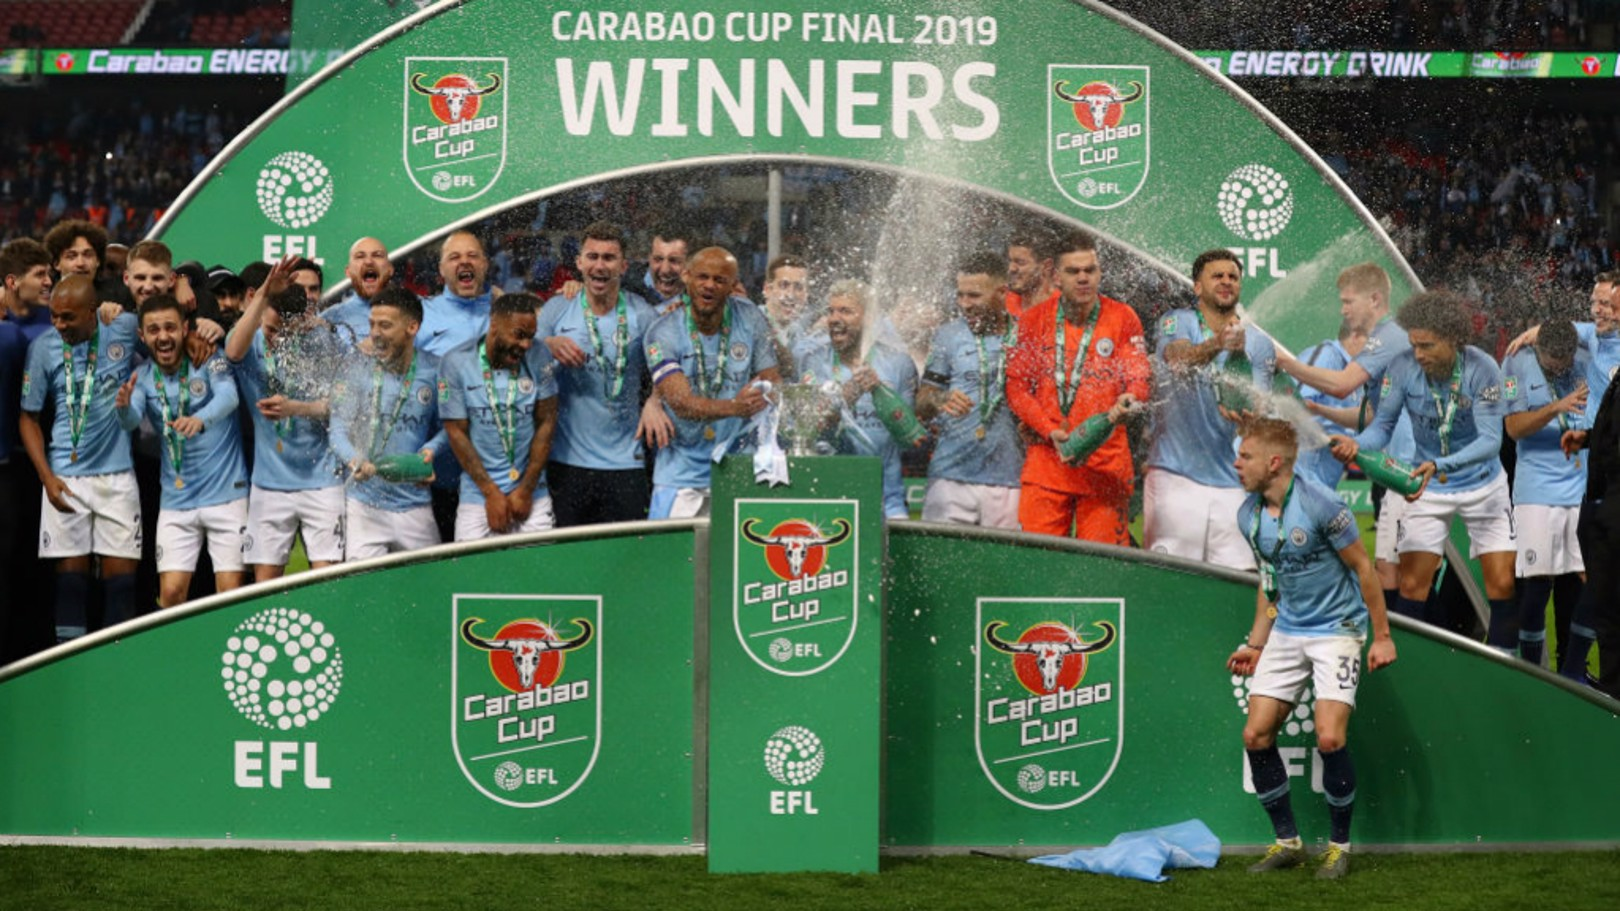 WINNERS: City lift the 2018/19 Carabao Cup at Wembley.